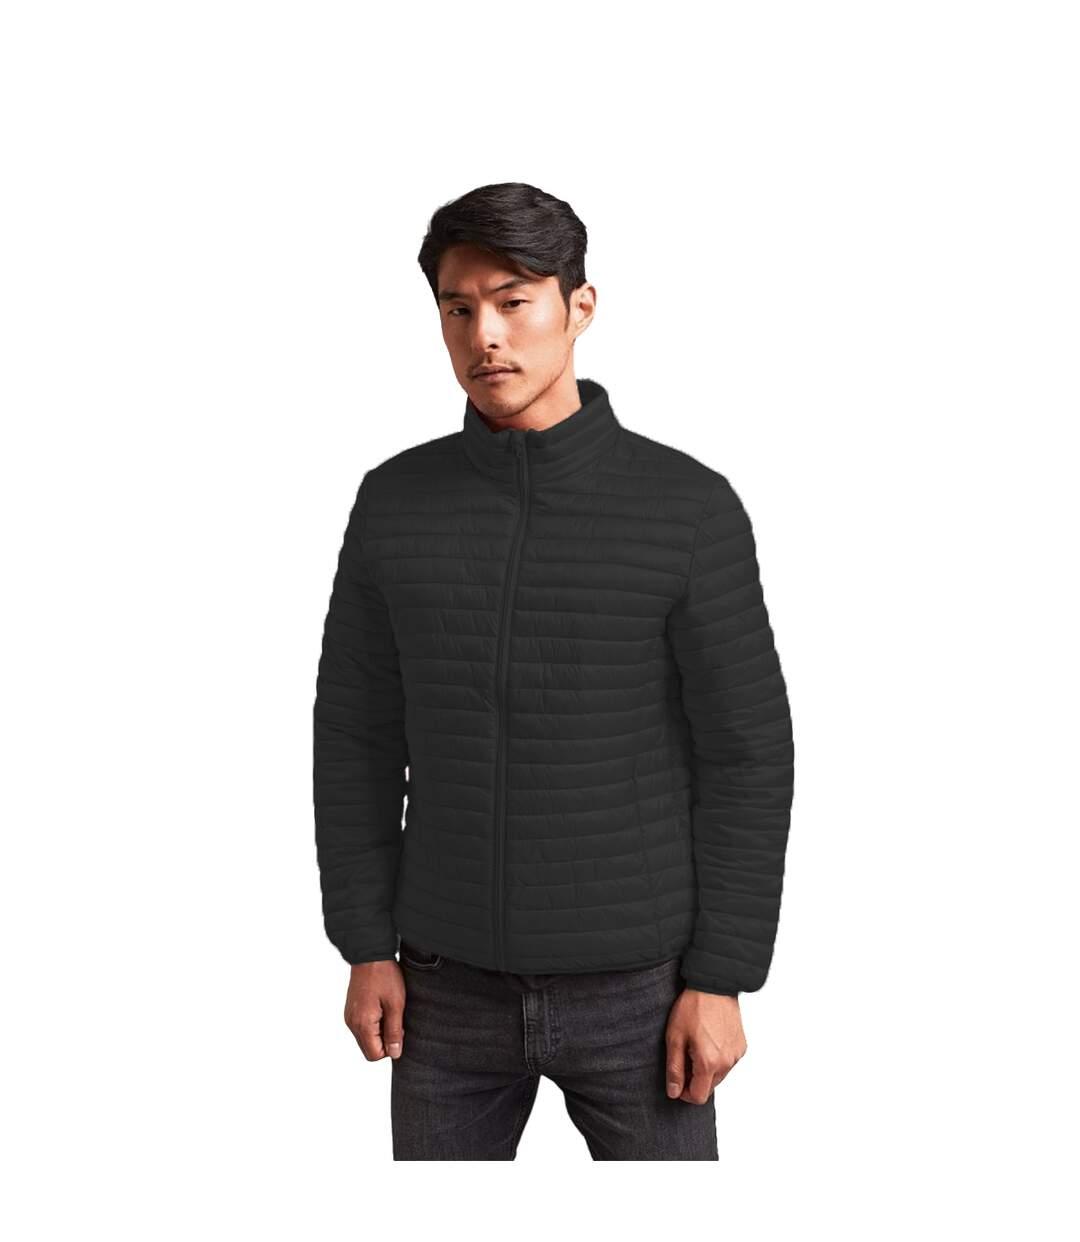 2786 Mens Tribe Fineline Padded Jacket (Bright Yellow) - UTRW3846